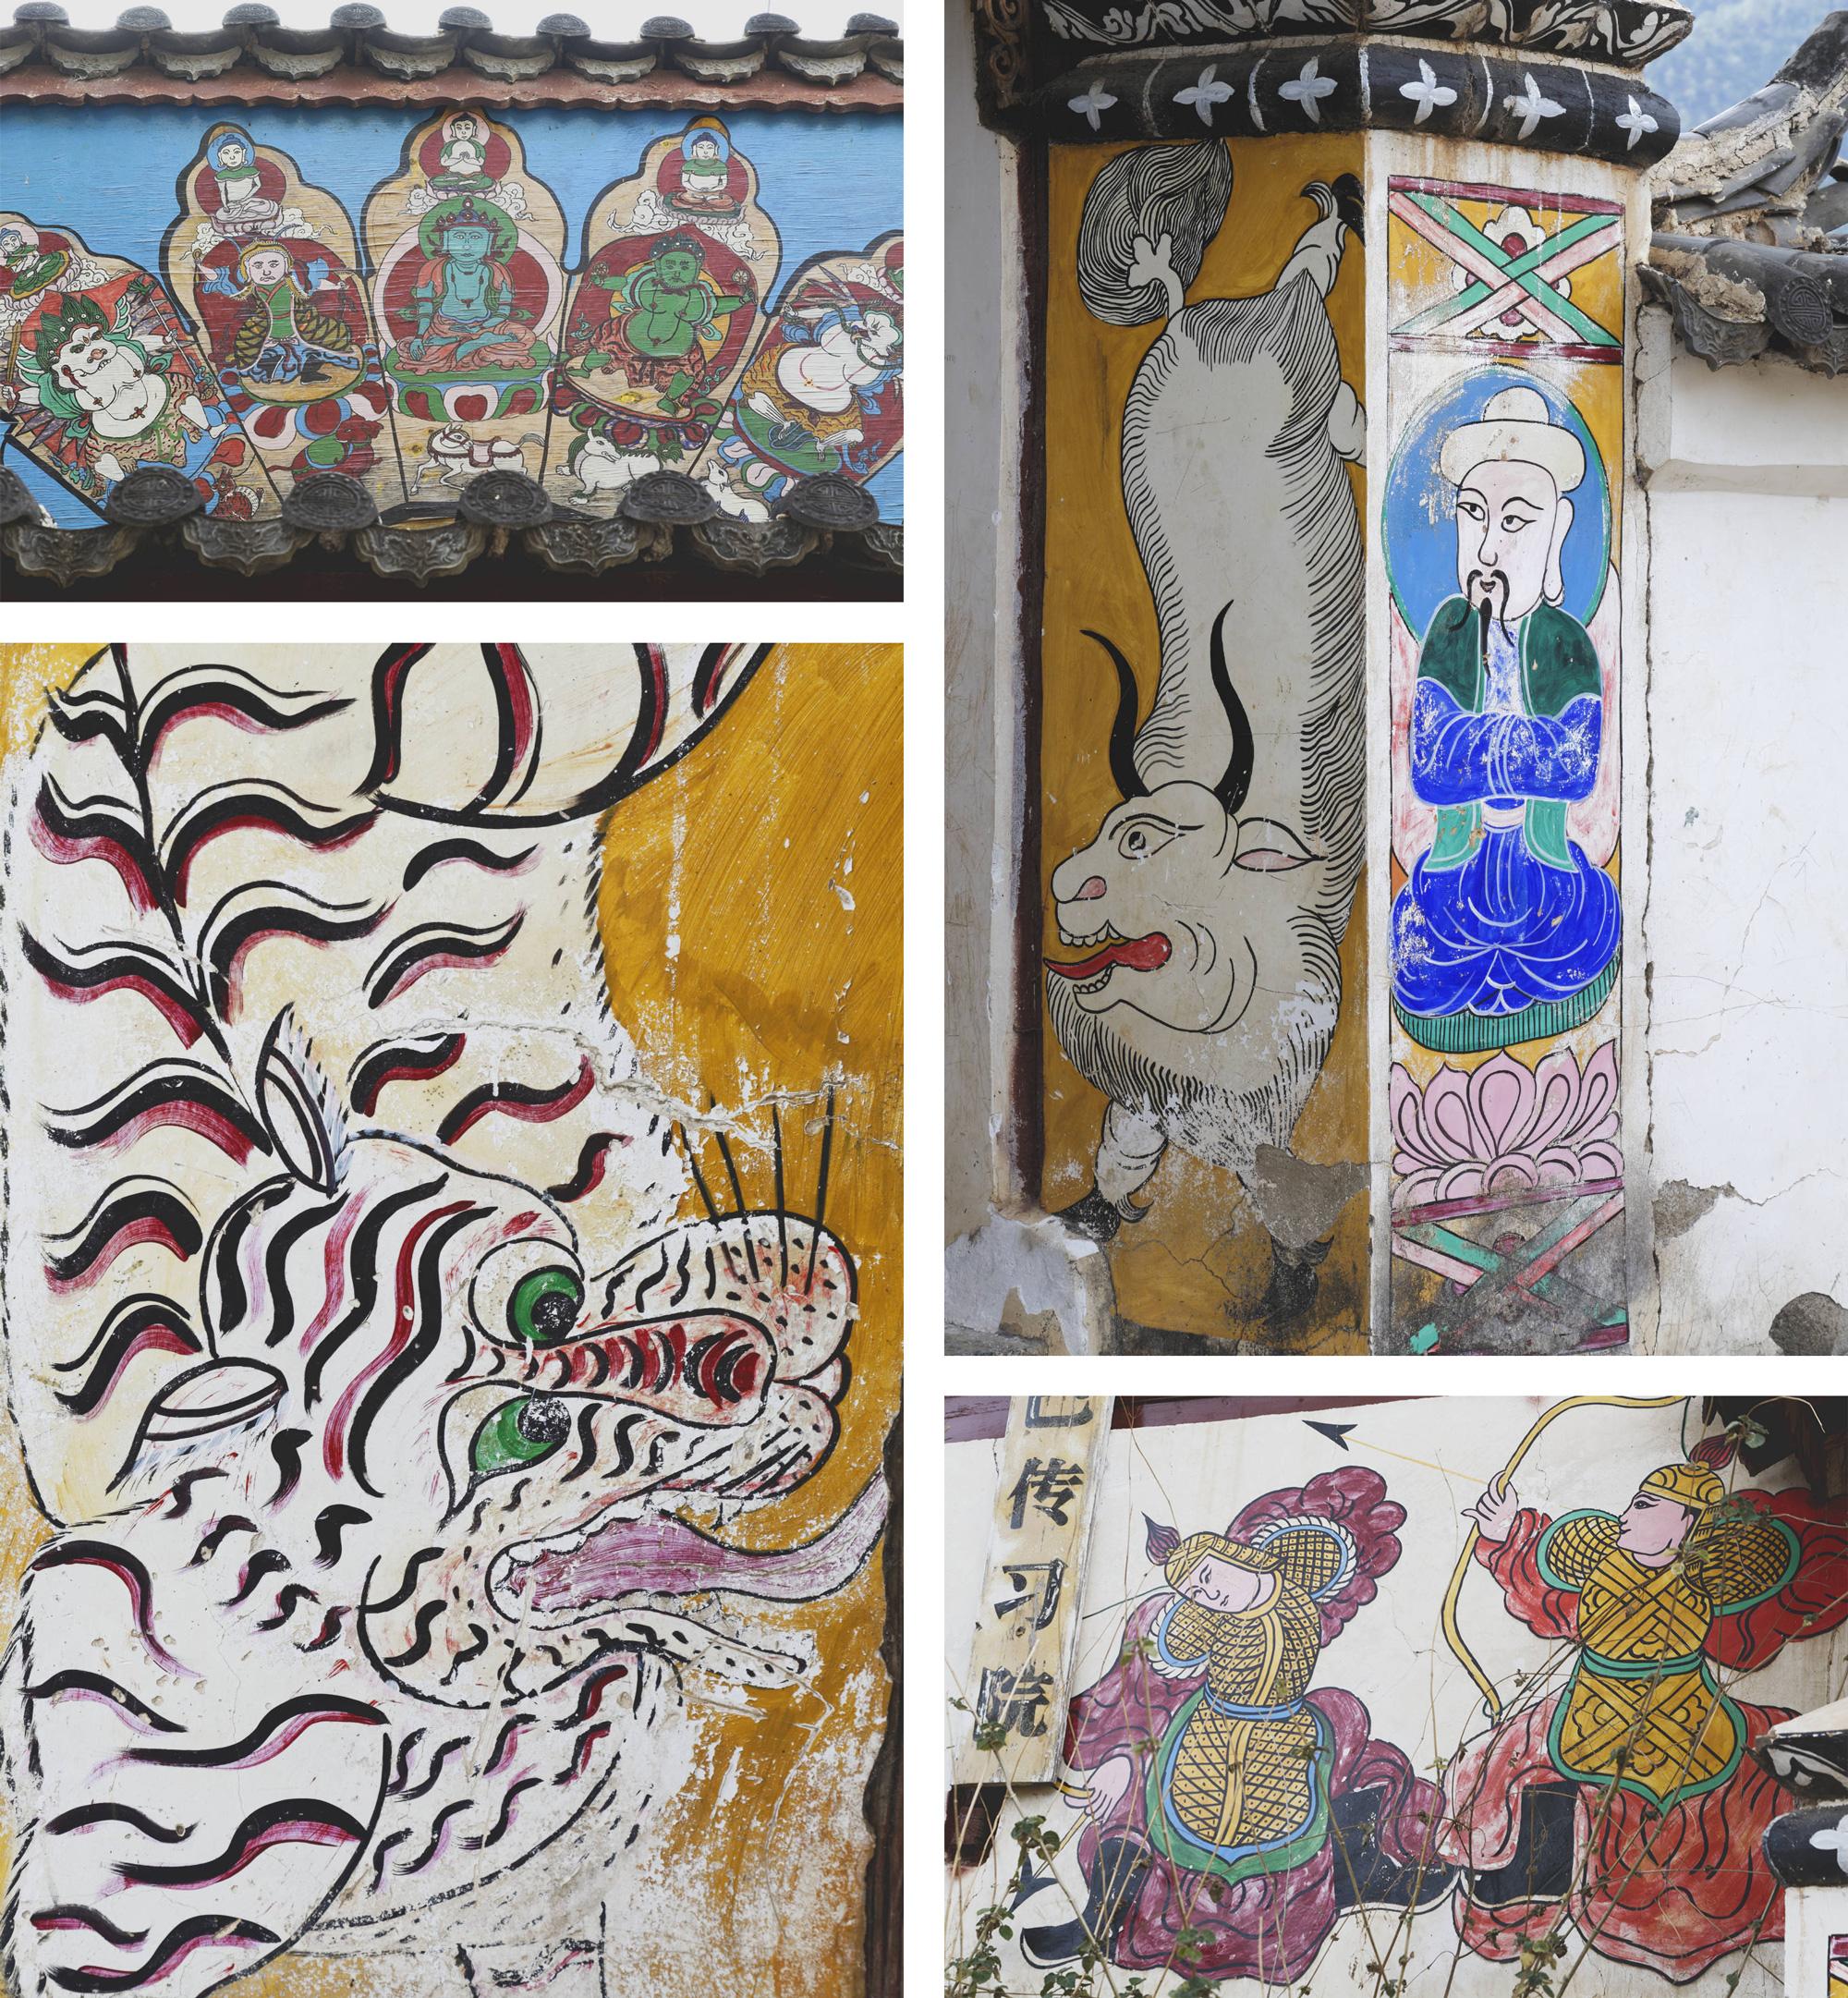 Peintures murales dongbas, village de Wumu